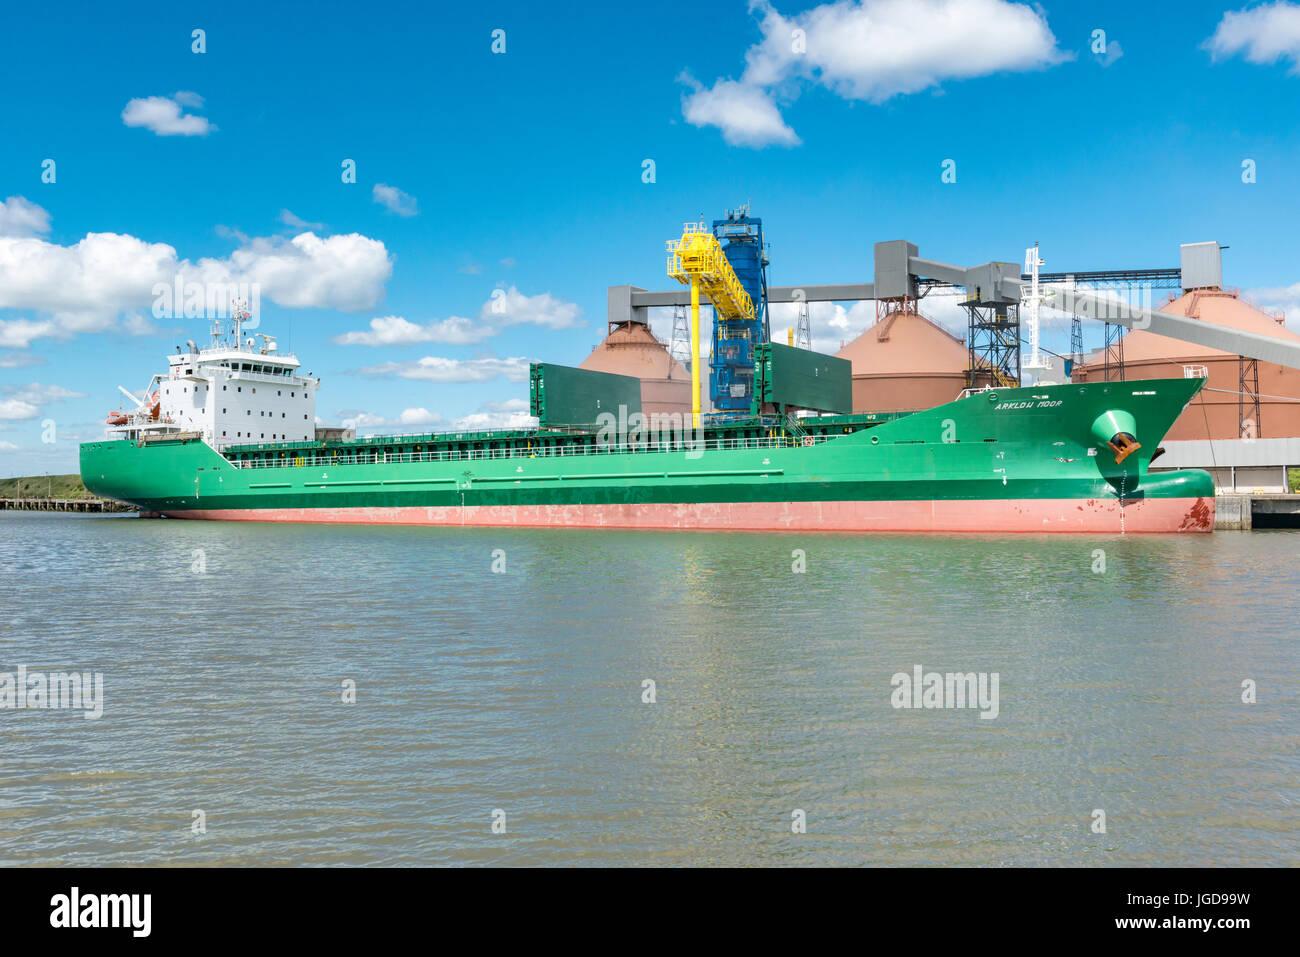 General Cargo Ship, Blyth, UK - Stock Image